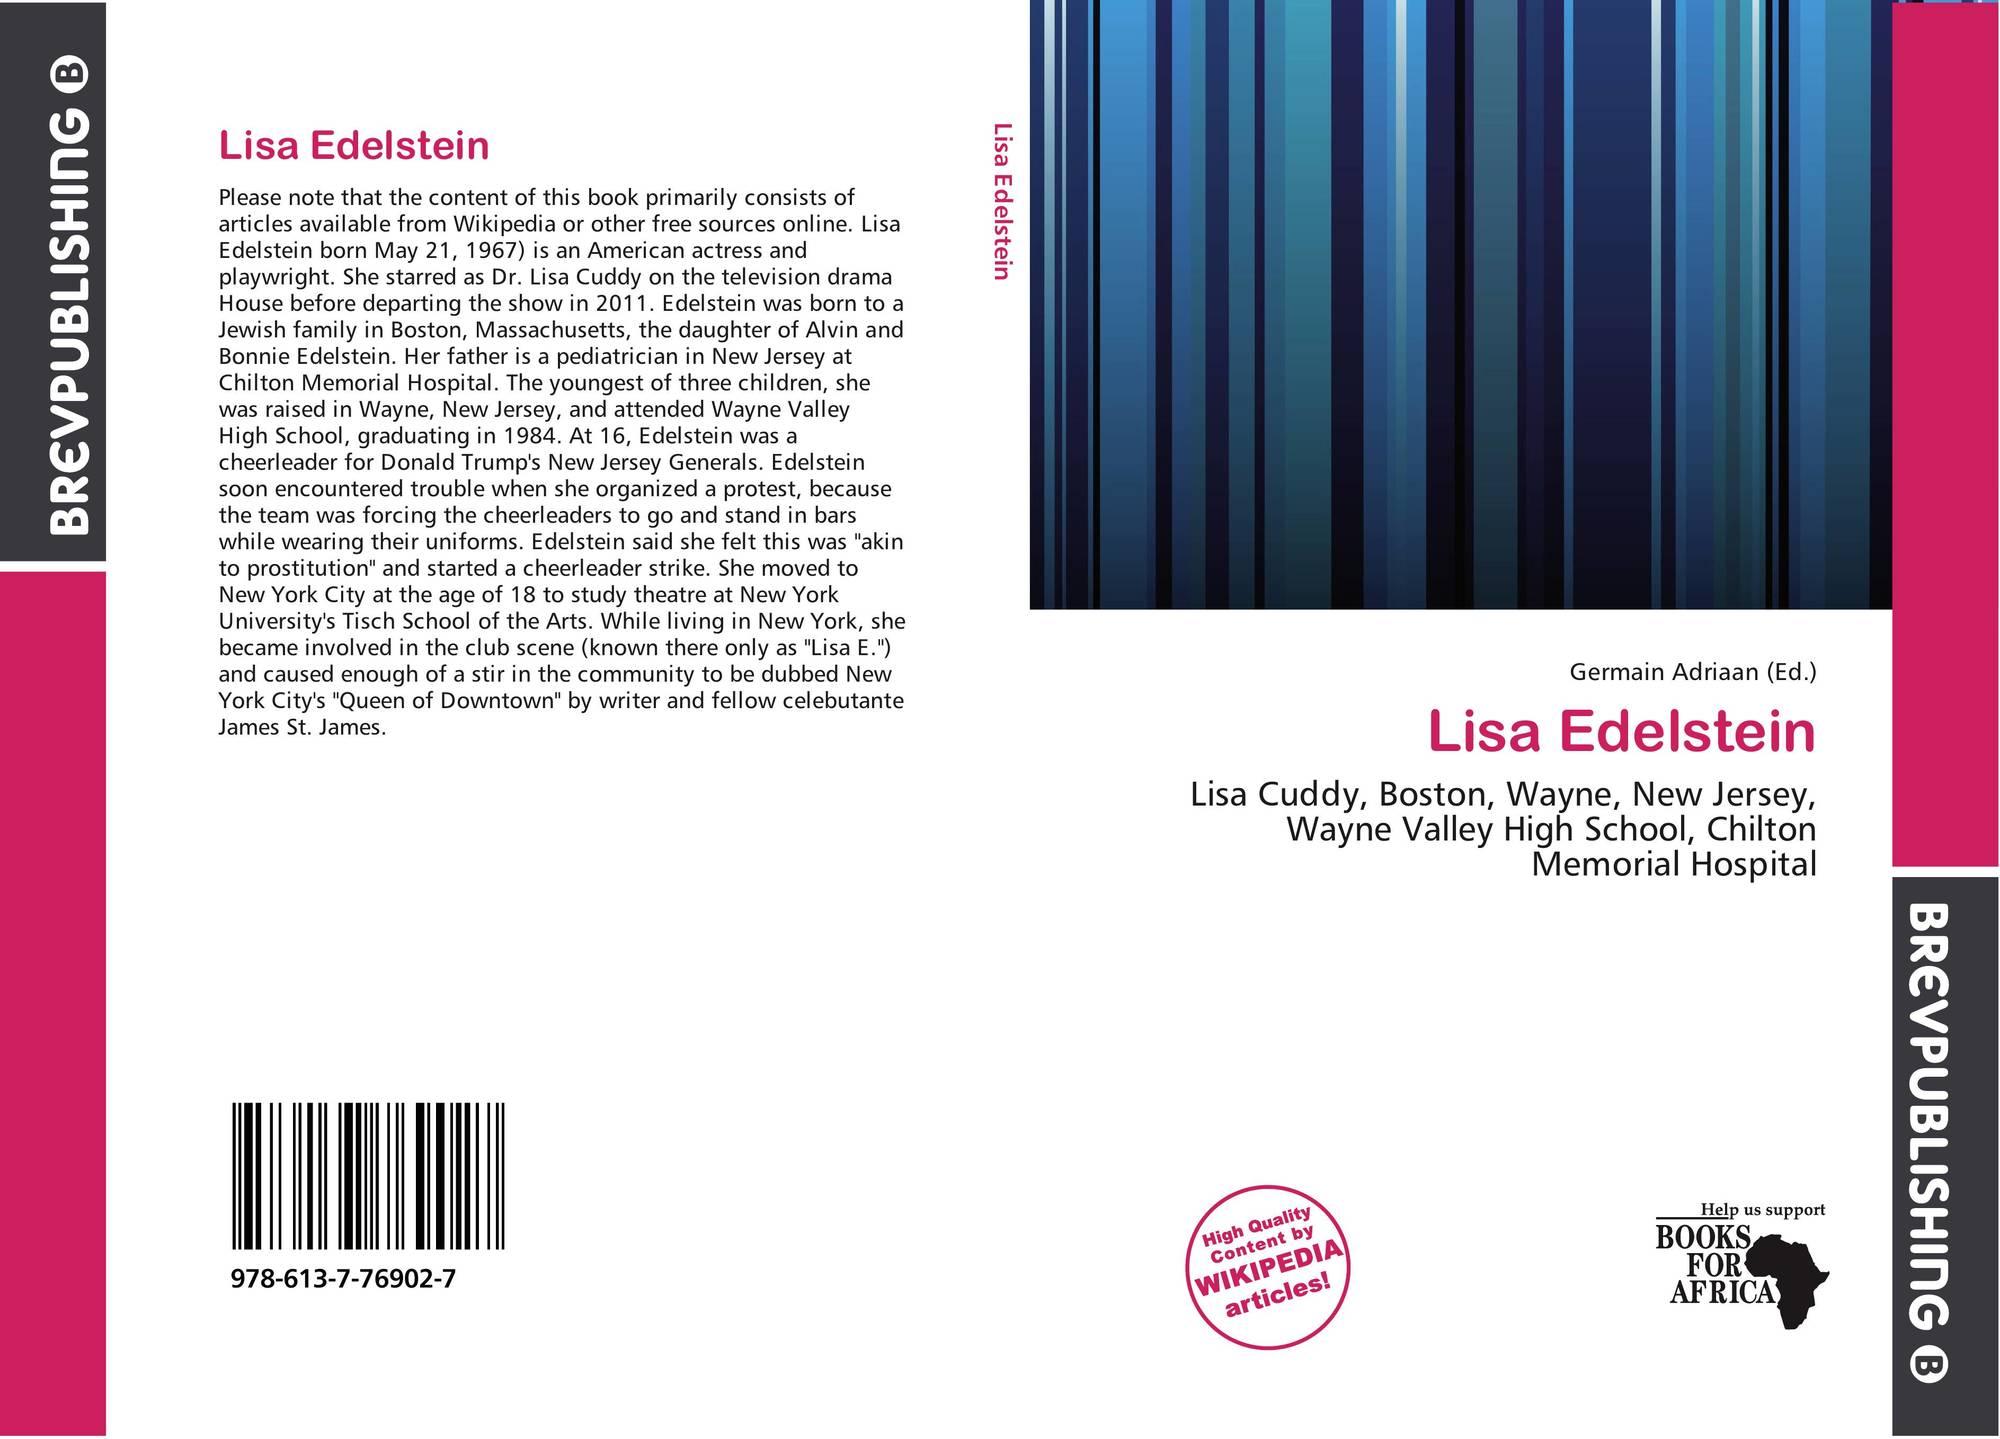 Lisa Edelstein, 978-613-7-76902-7, 613776902X ,9786137769027